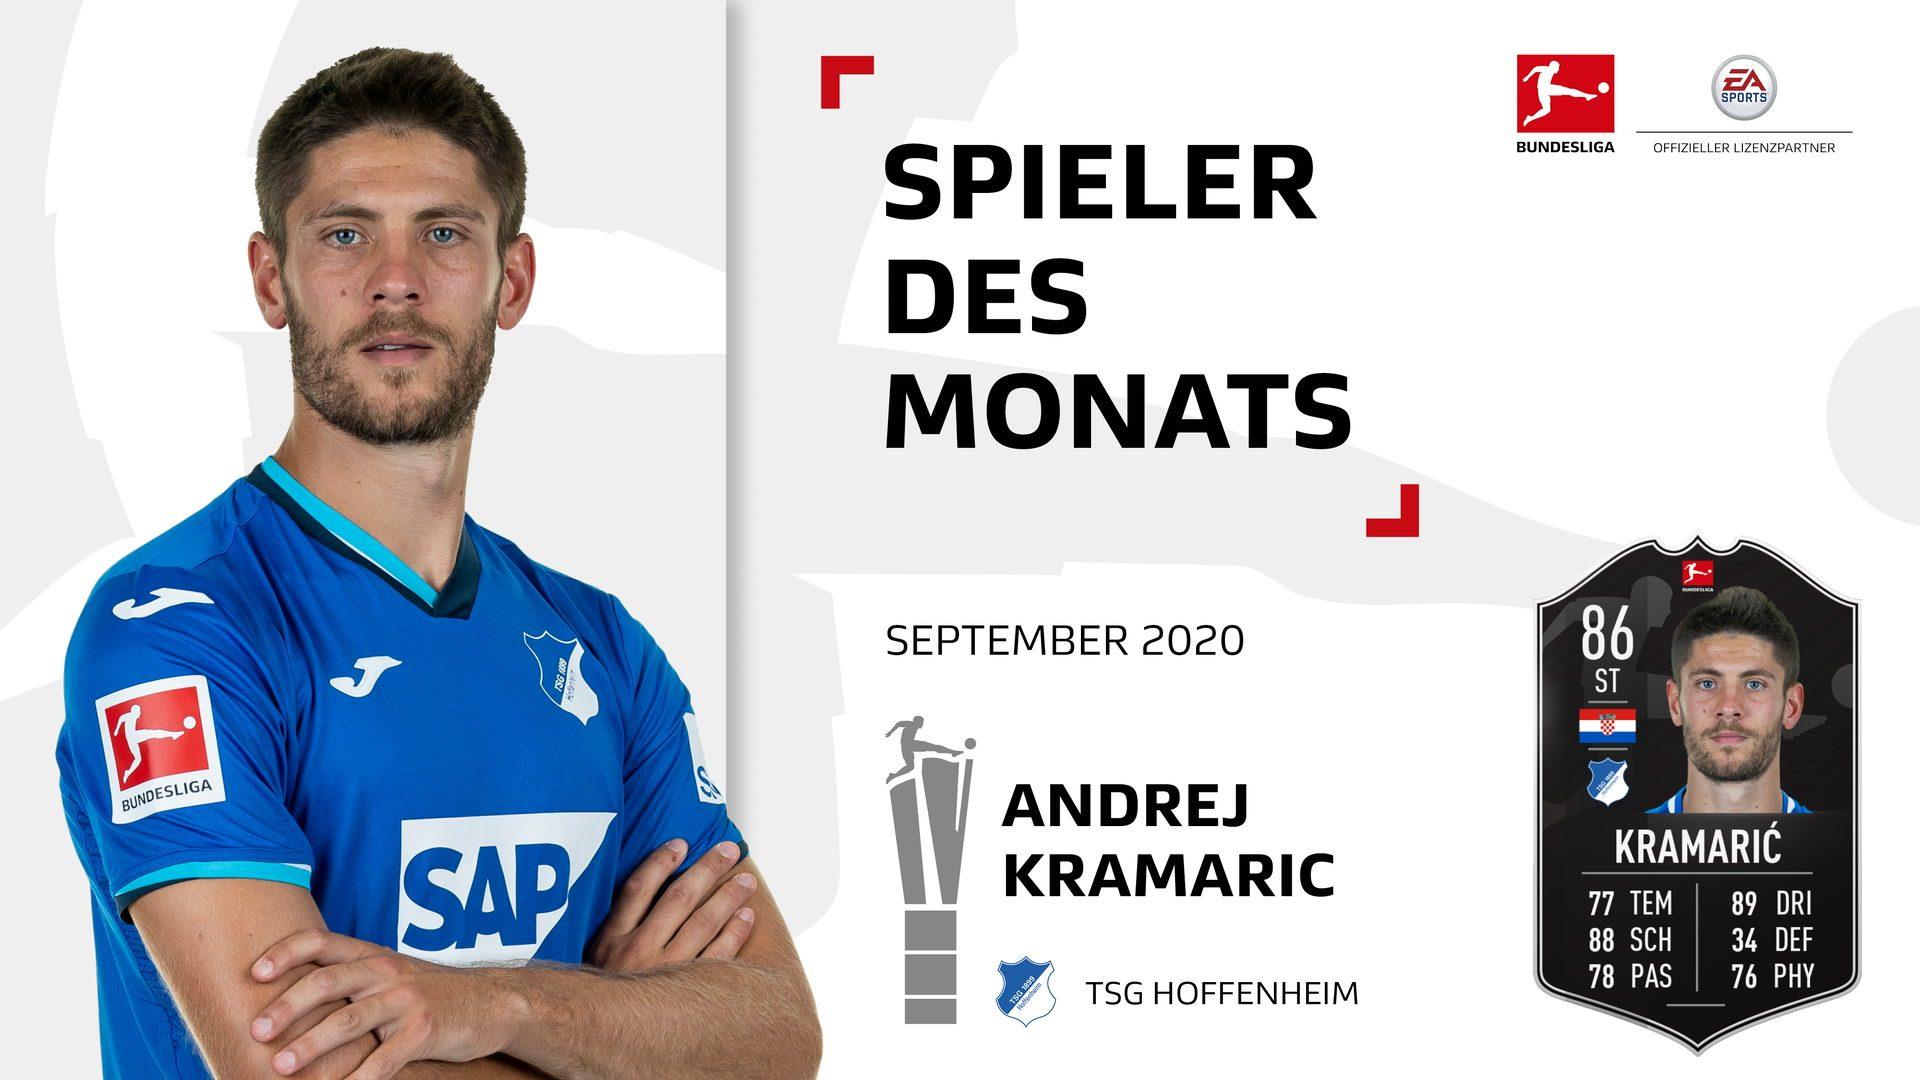 Andrej Kramaric ist Spieler des Monats September